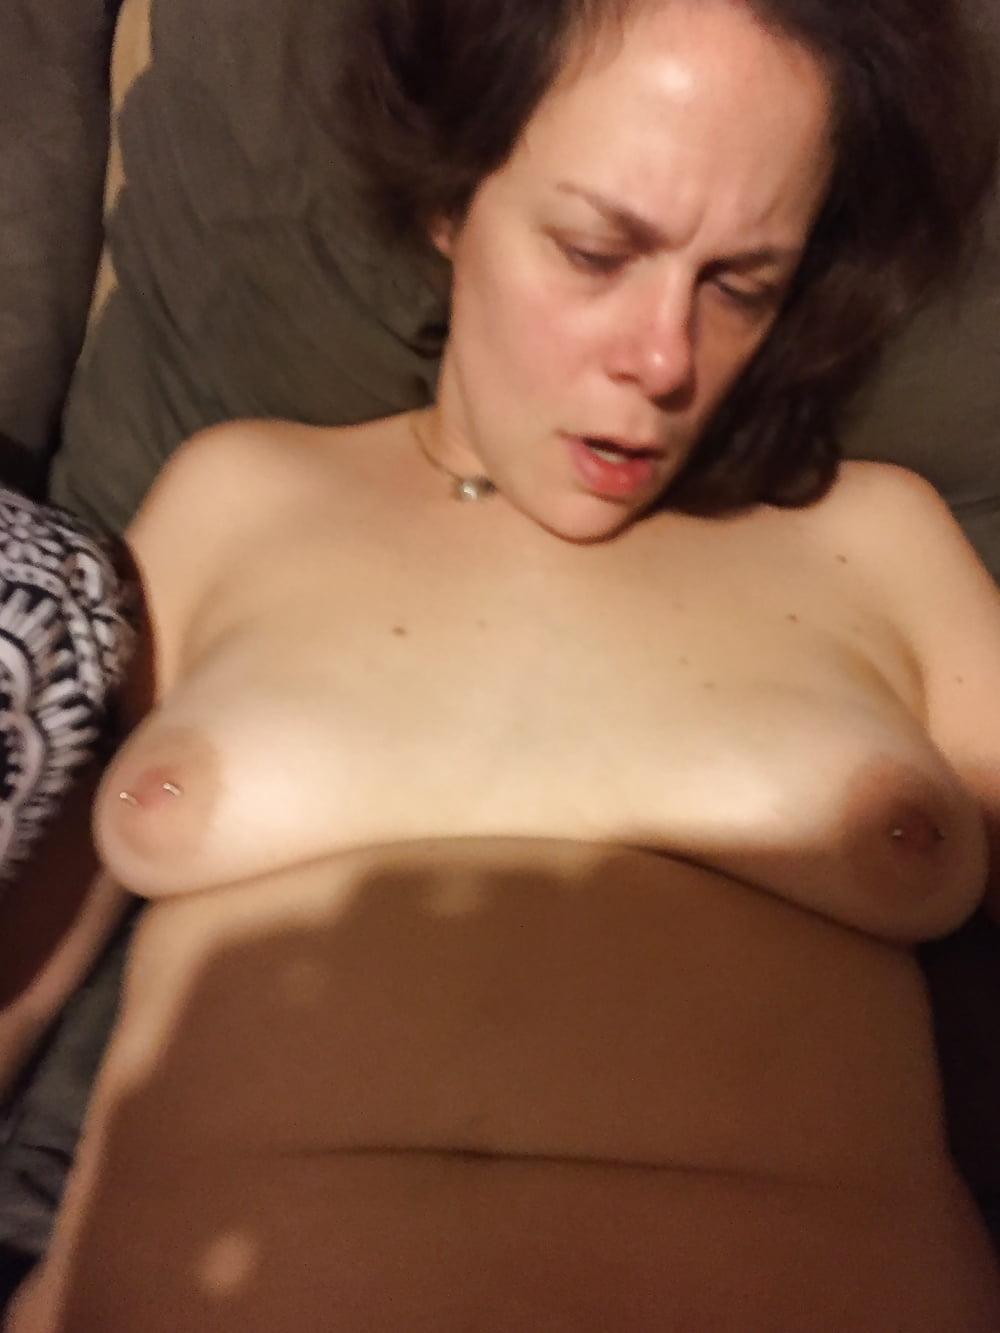 Borzea recommends Femdom bitch tube